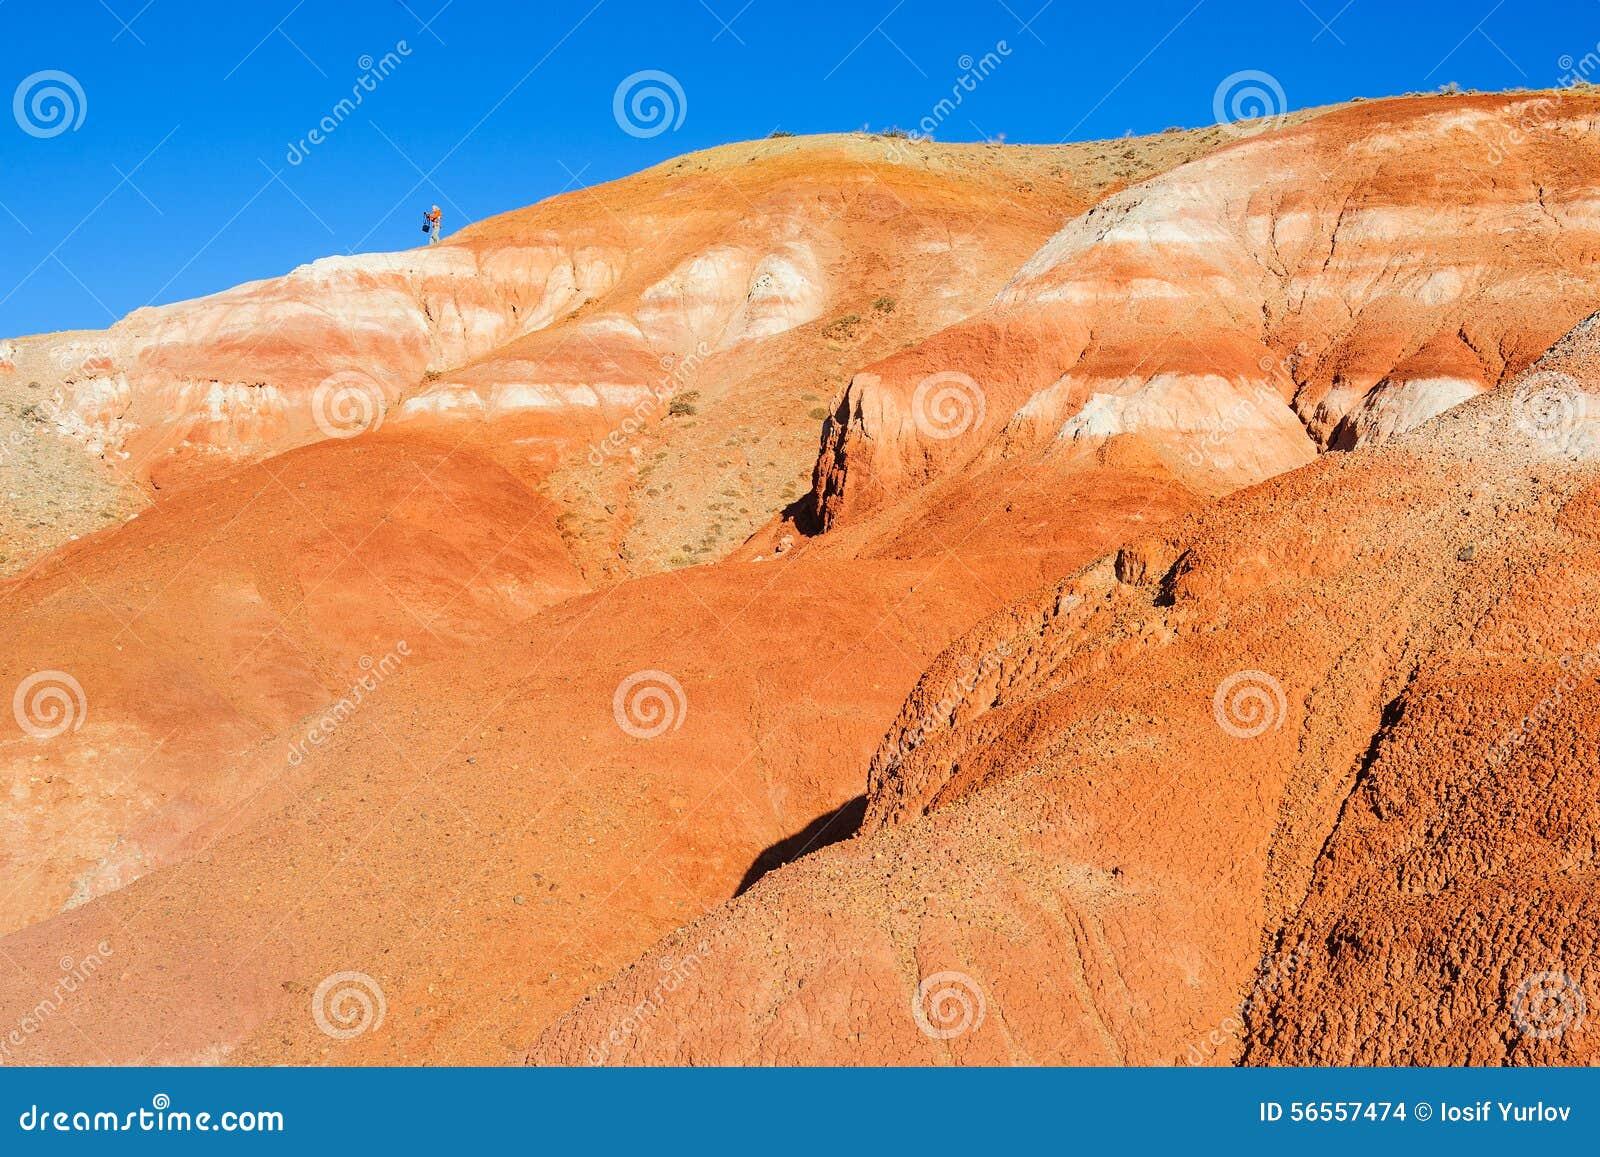 Download Χώμα χρώματος των καταθέσεων υδραργύρου σε Altai Στοκ Εικόνες - εικόνα από χρώμα, επαρχία: 56557474